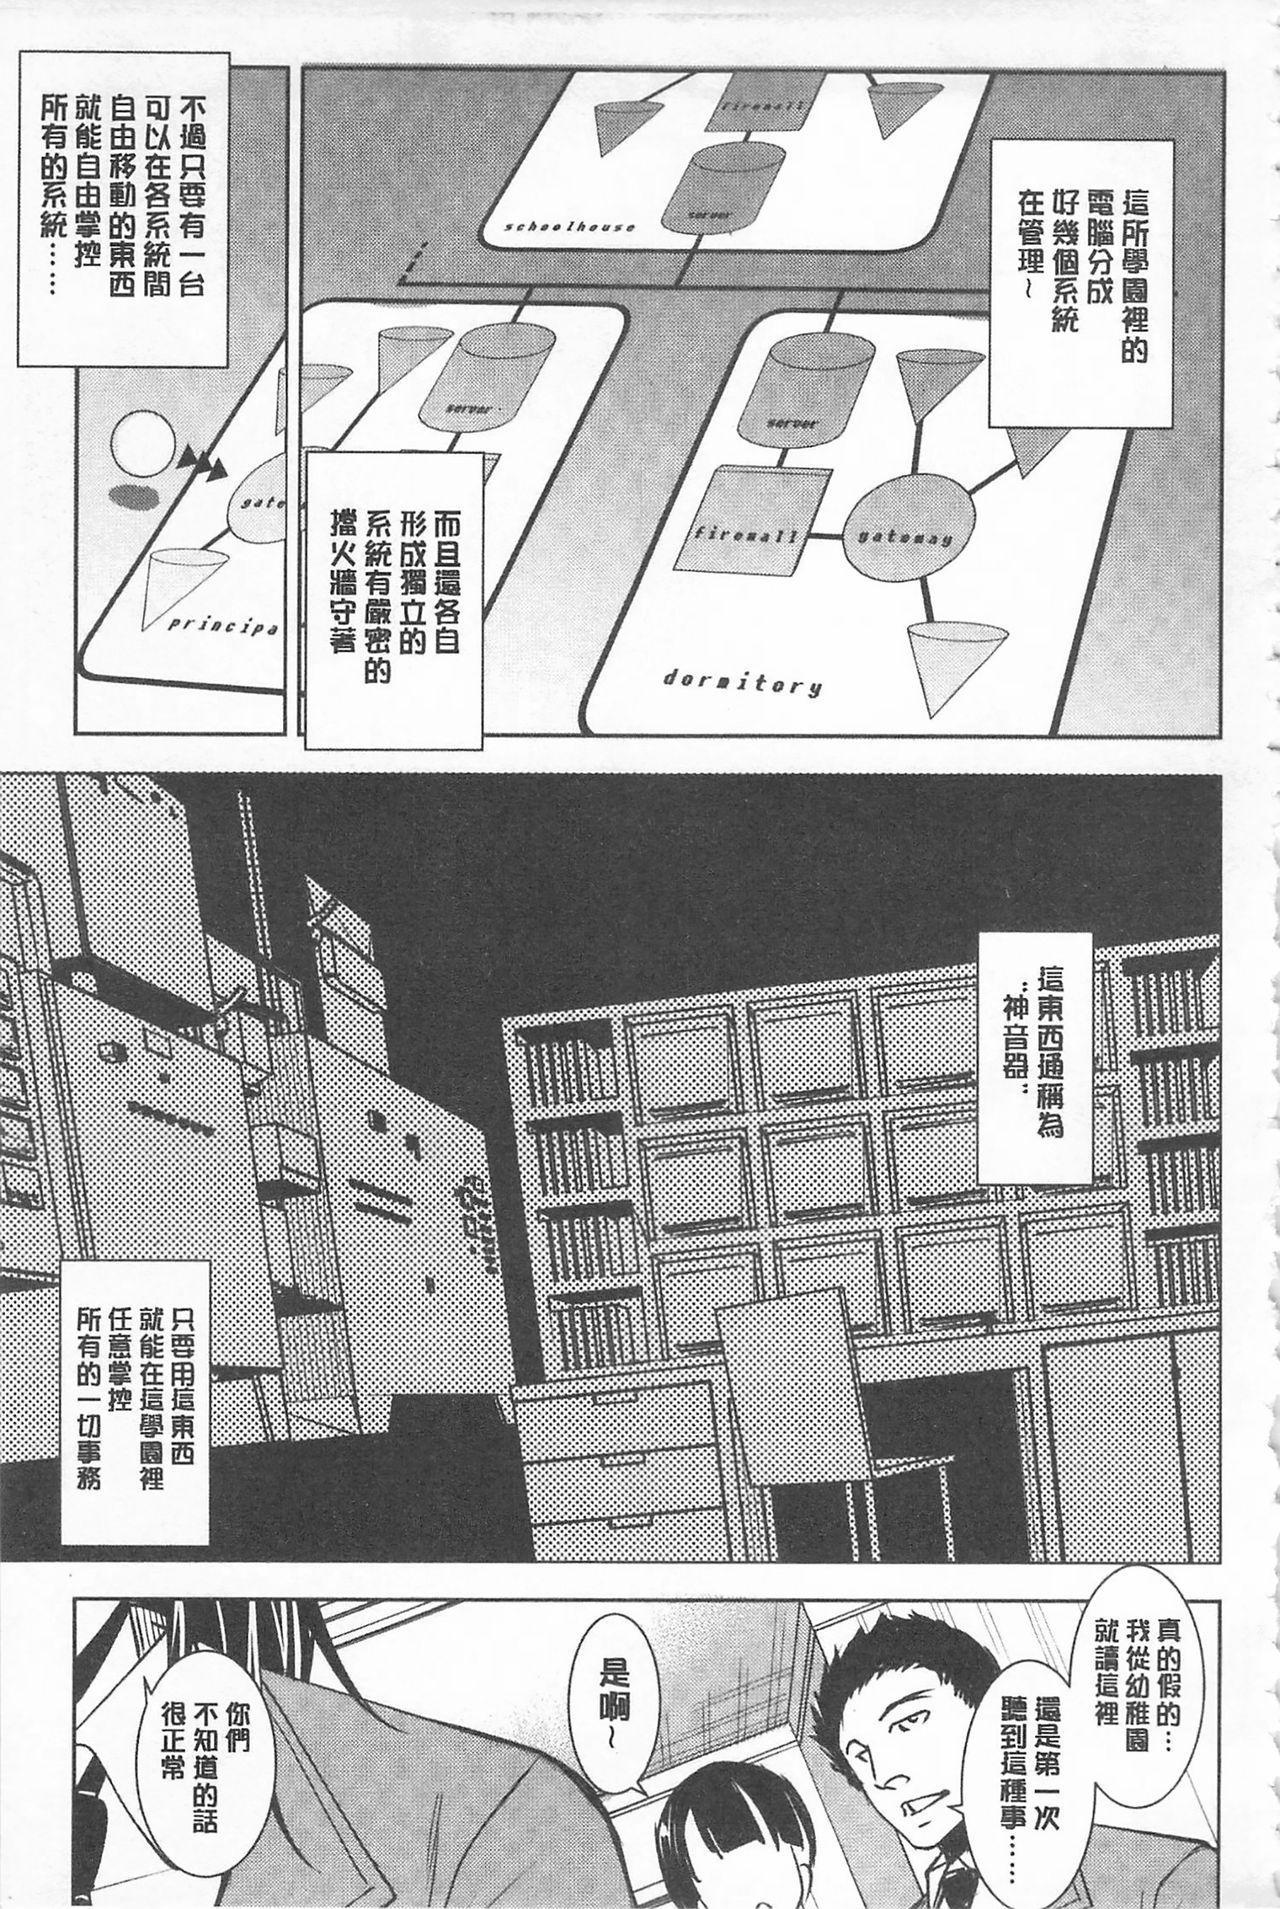 [Amano Kazumi] Seida Inyou -Seijo no Katachi Shita Intou- | 聖墮陰陽 -聖女的容貌與淫蕩- [Chinese] 114